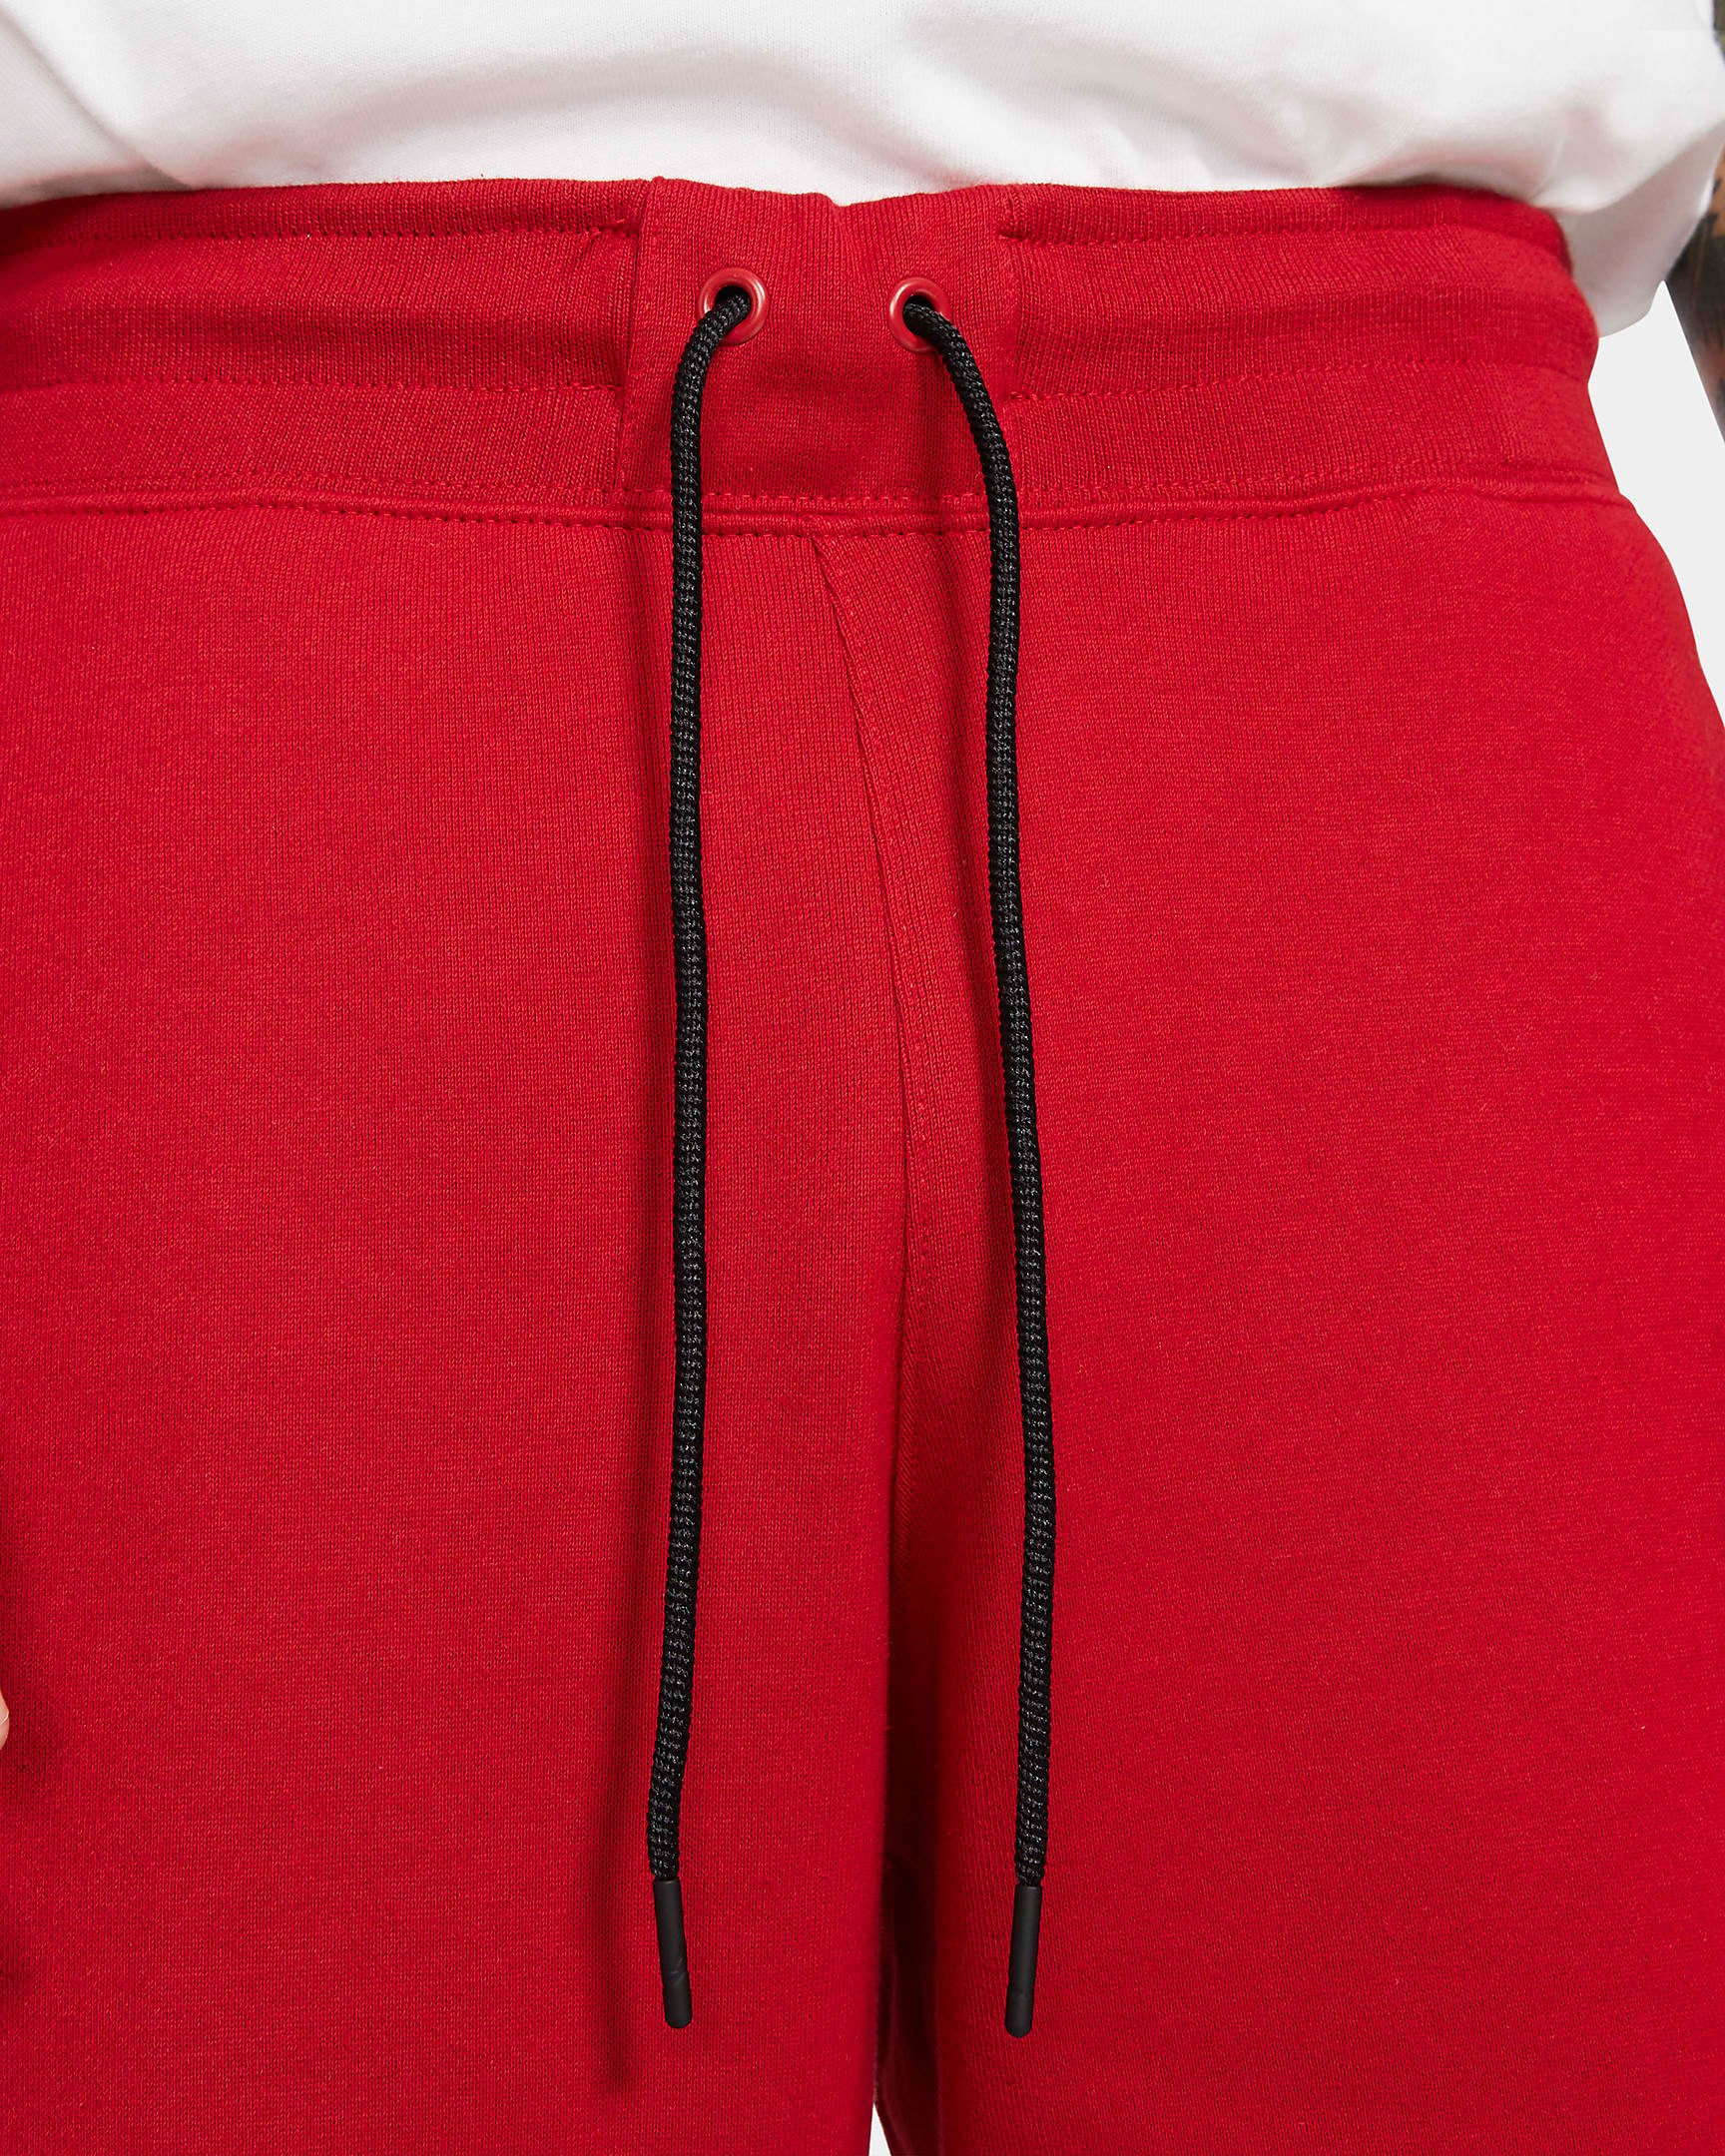 jordan-jumpman-classics-fleece-shorts-gym-red-black-6